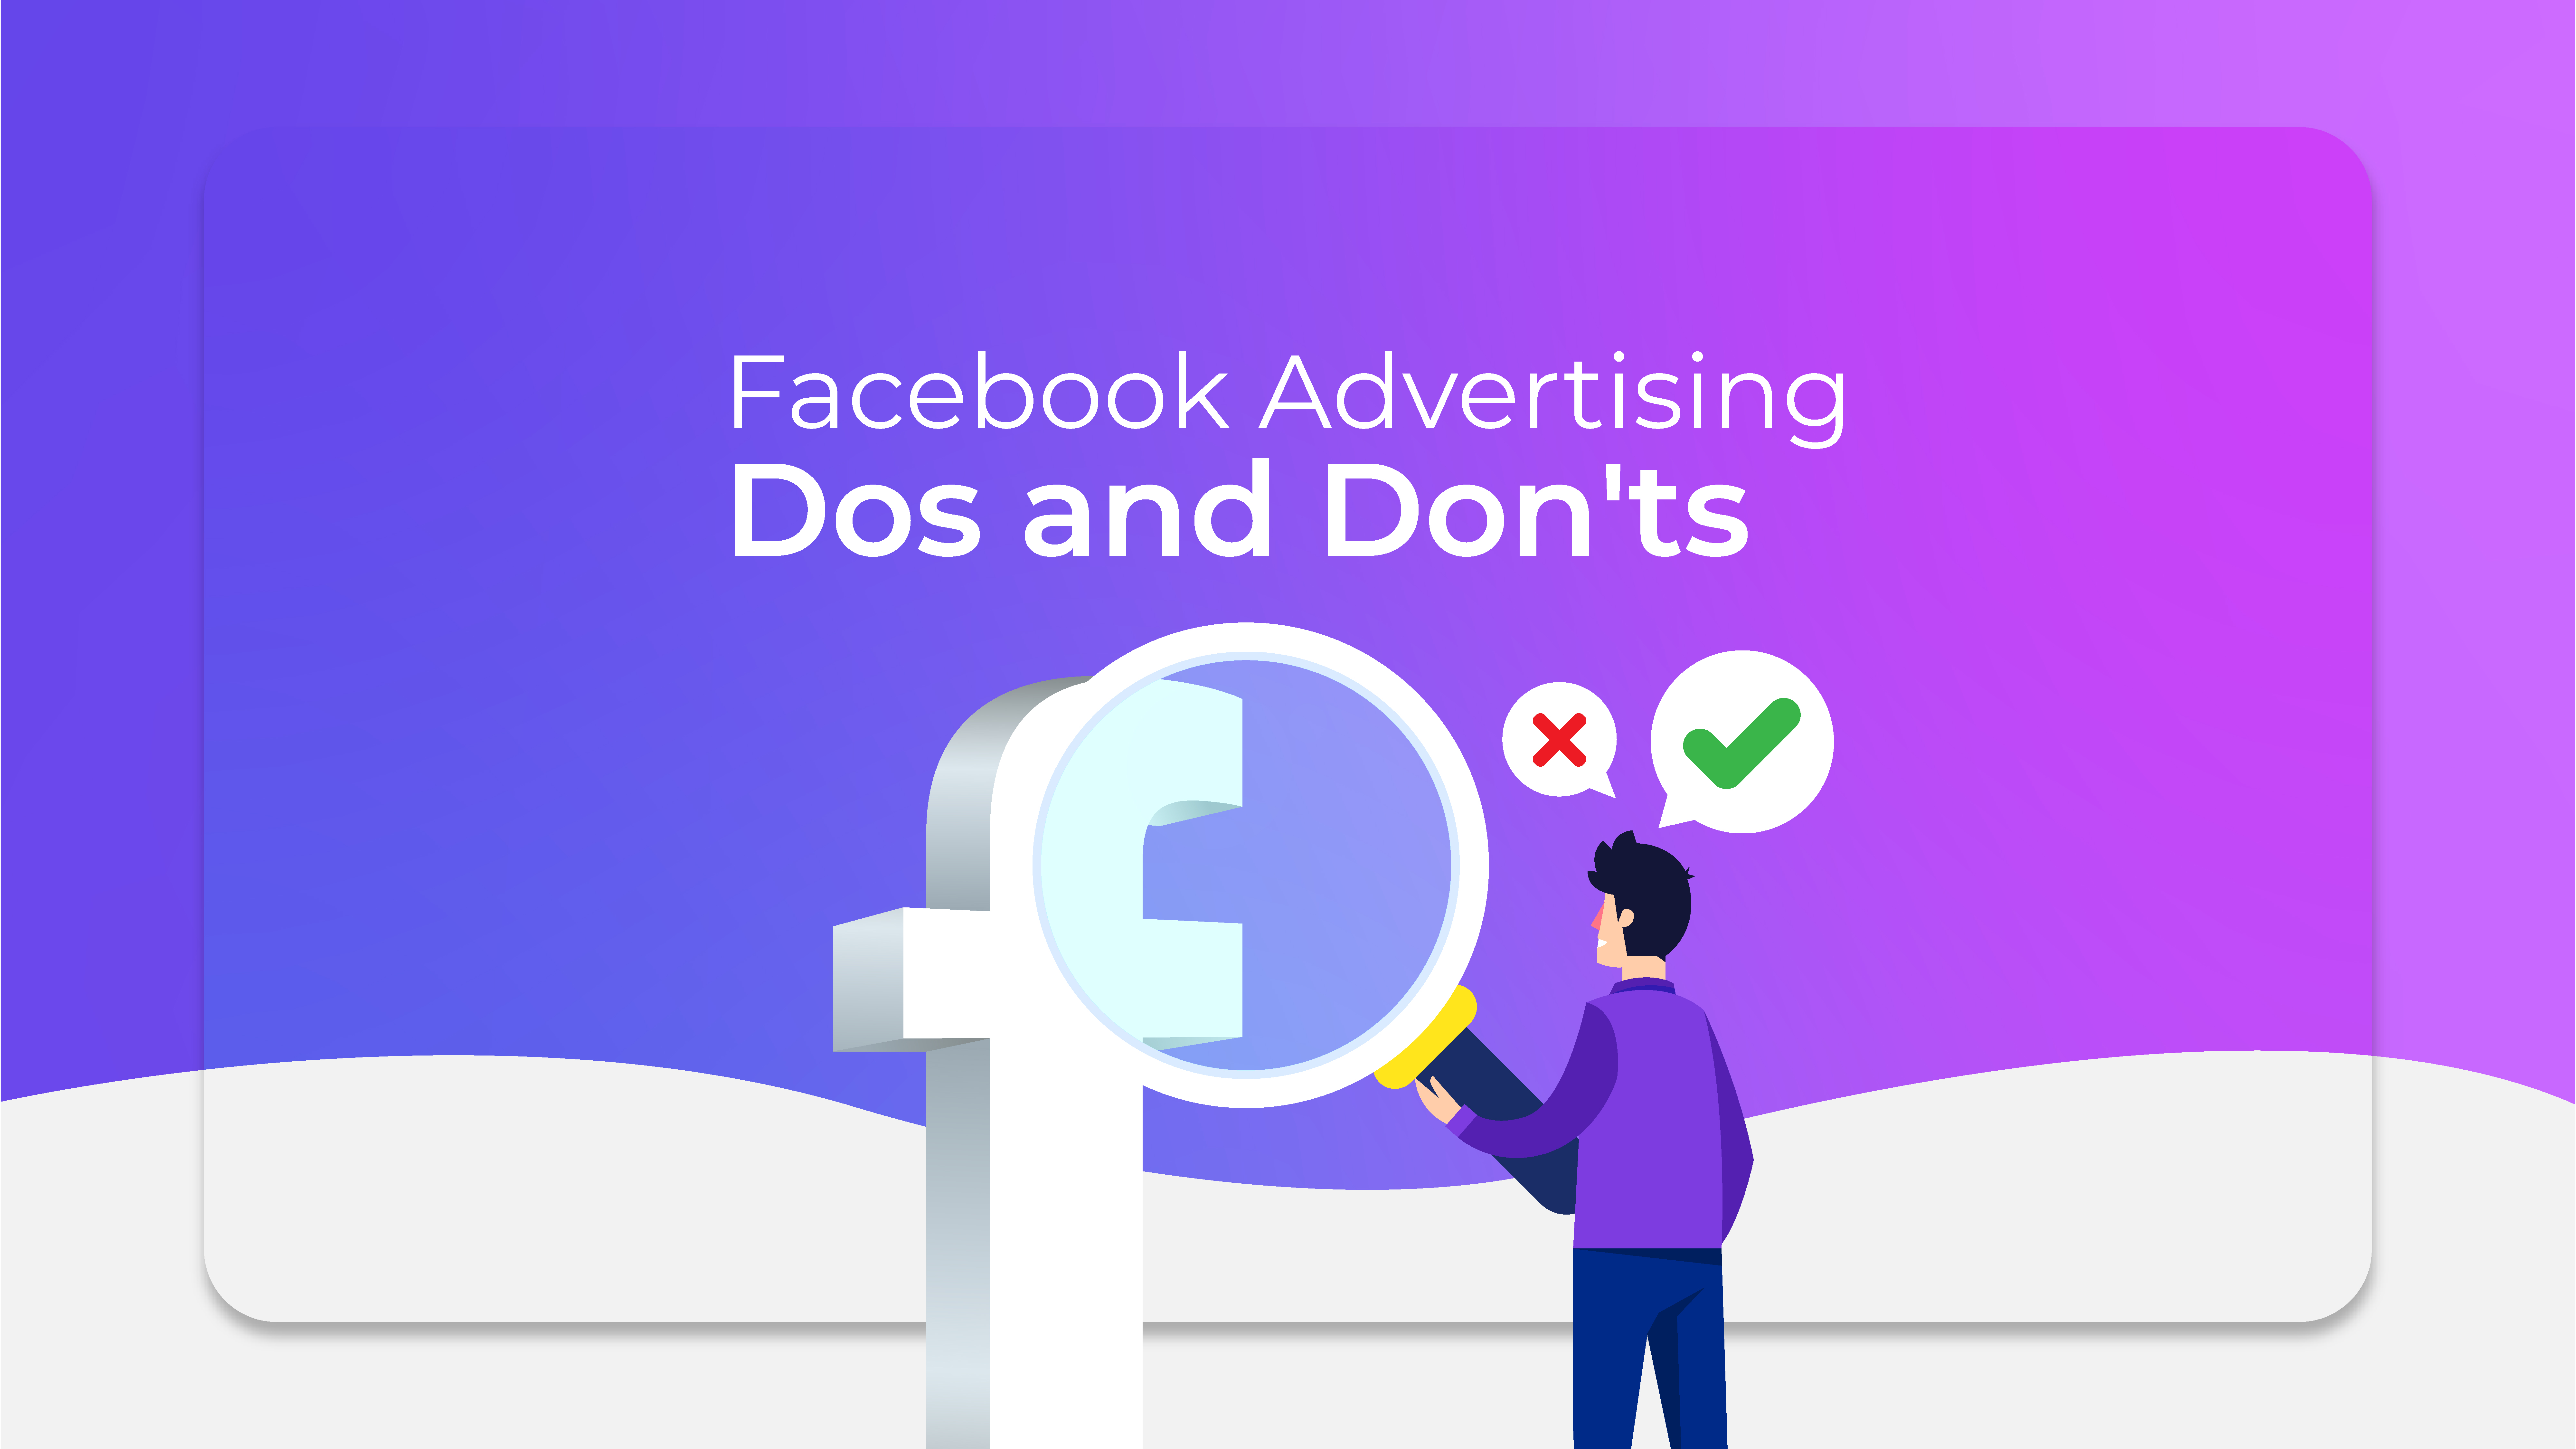 Facebook Advertising Dos and Don'ts